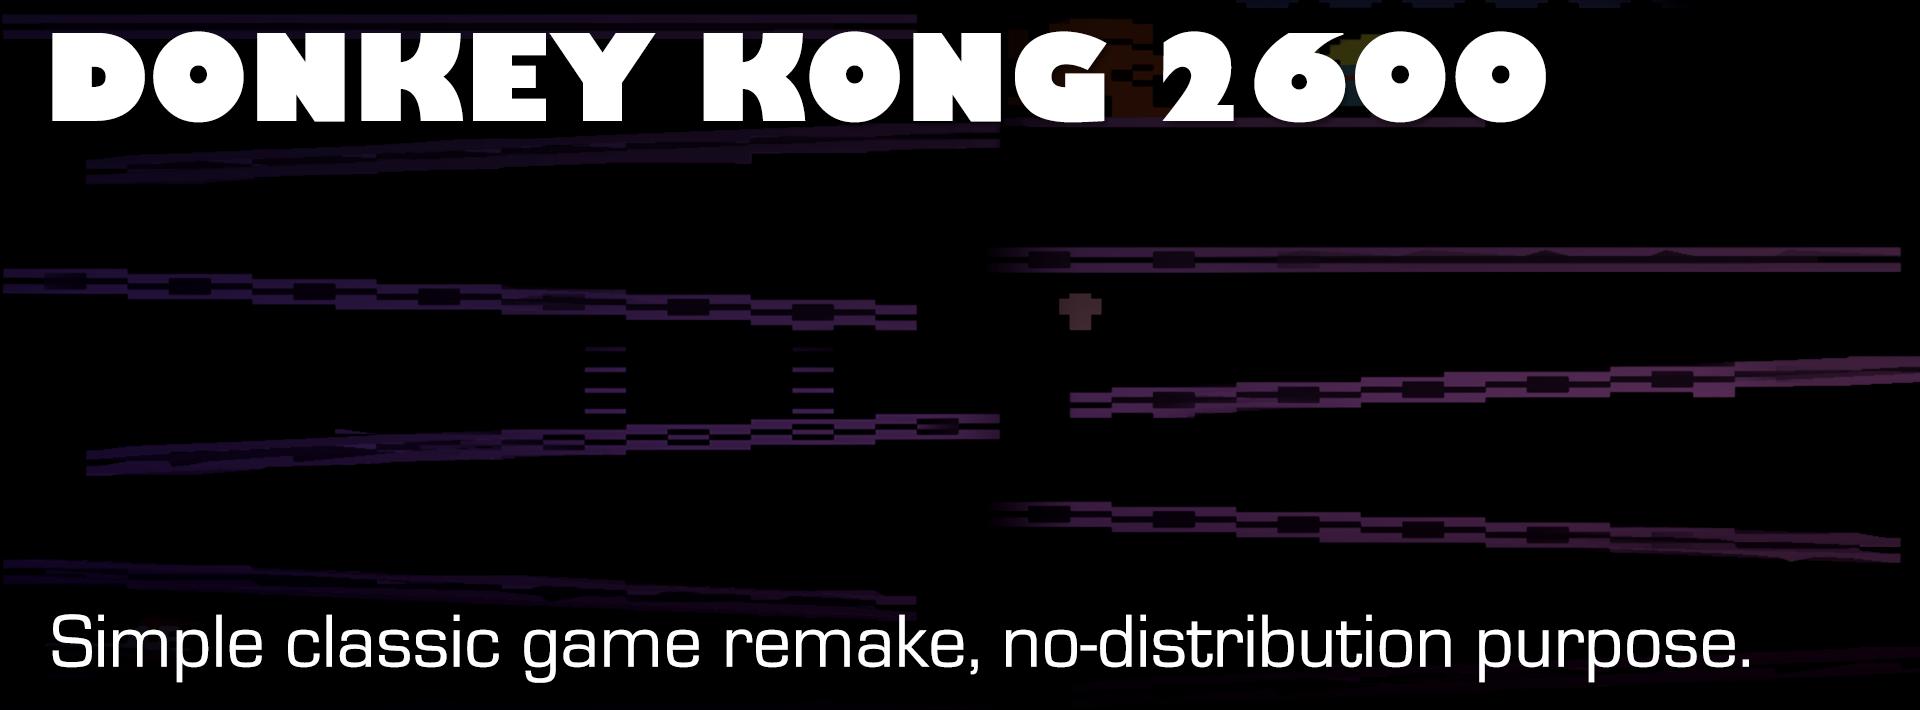 Remake - Donkey Kong 2600